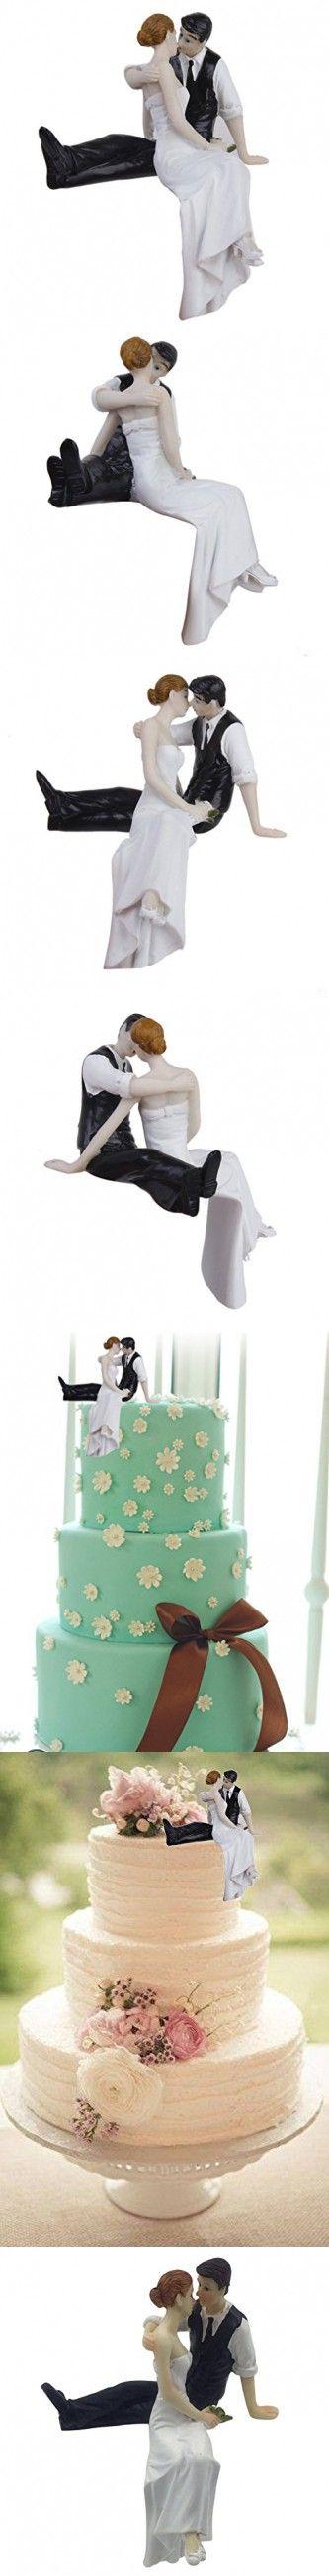 Romantic Look of Love Bride and Groom Wedding Cake Topper Cake Decoration Figurine Keepsake